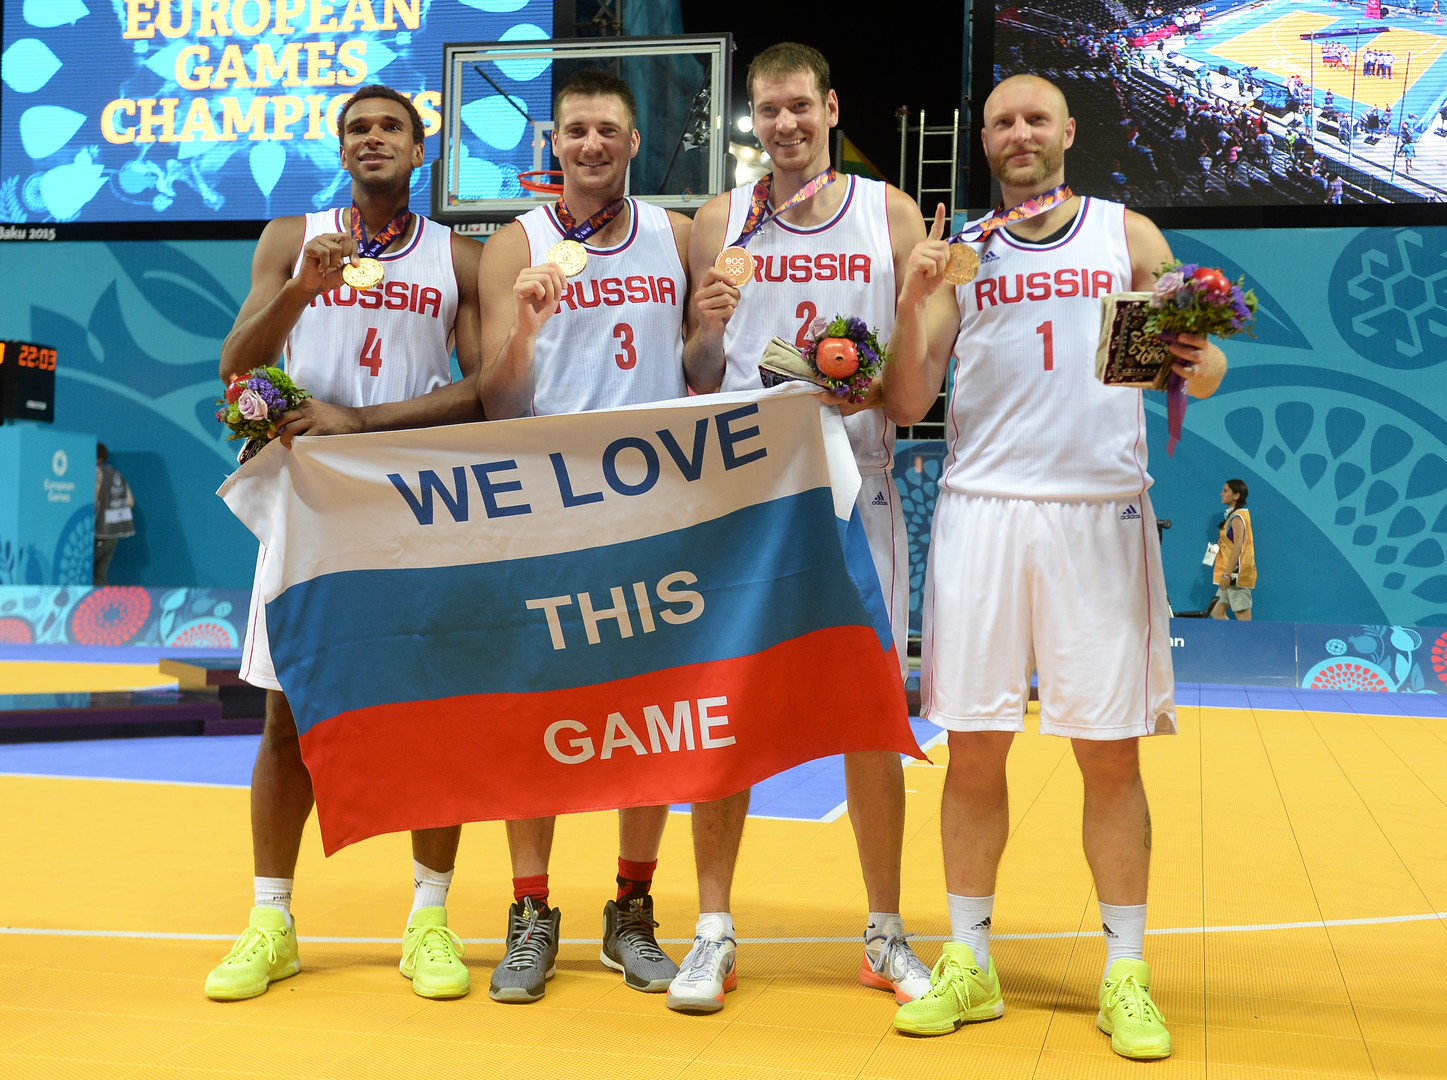 Russische Basketballspieler bei den Europaspielen 2015 in Baku